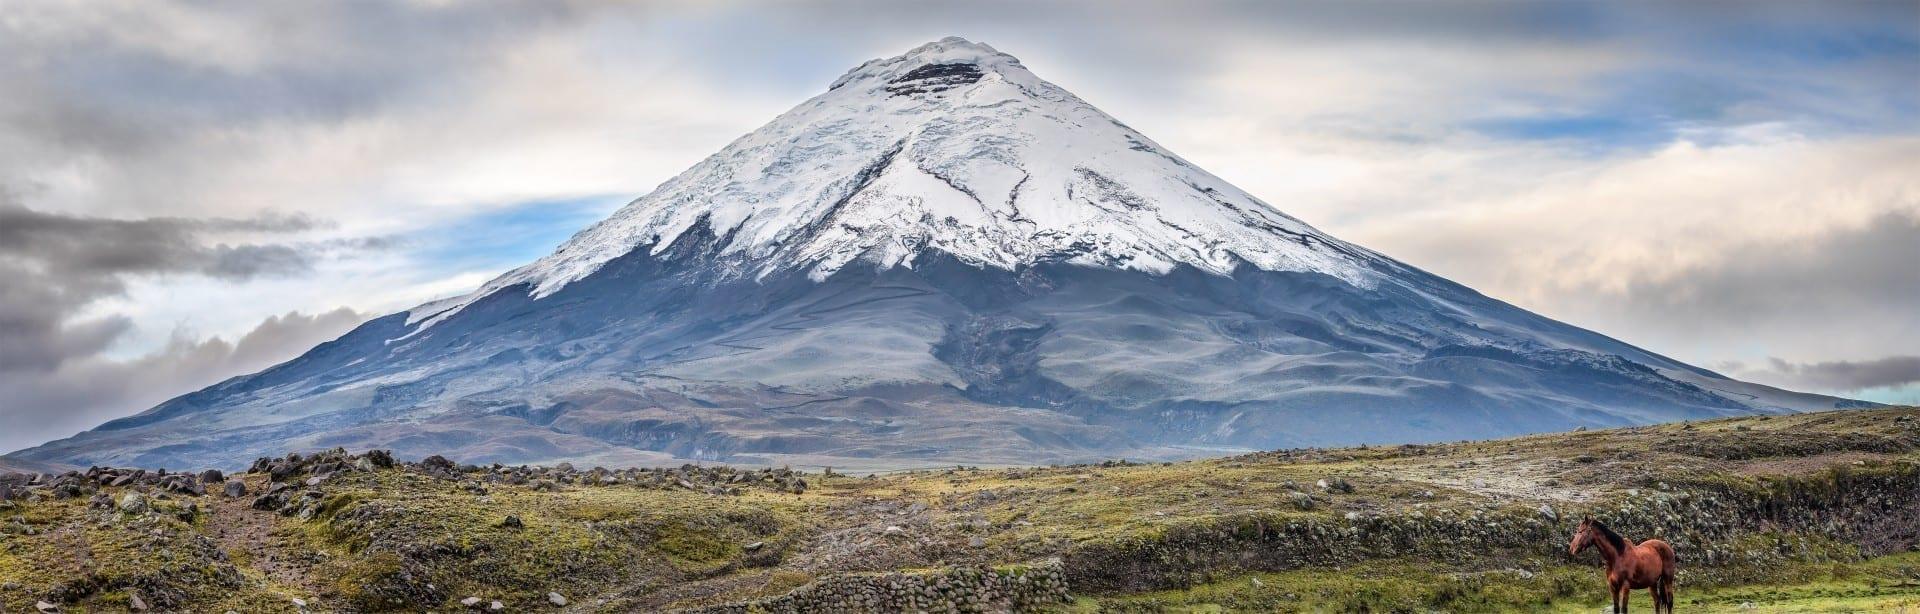 Vista del Cotopaxi Cotopaxi Ecuador